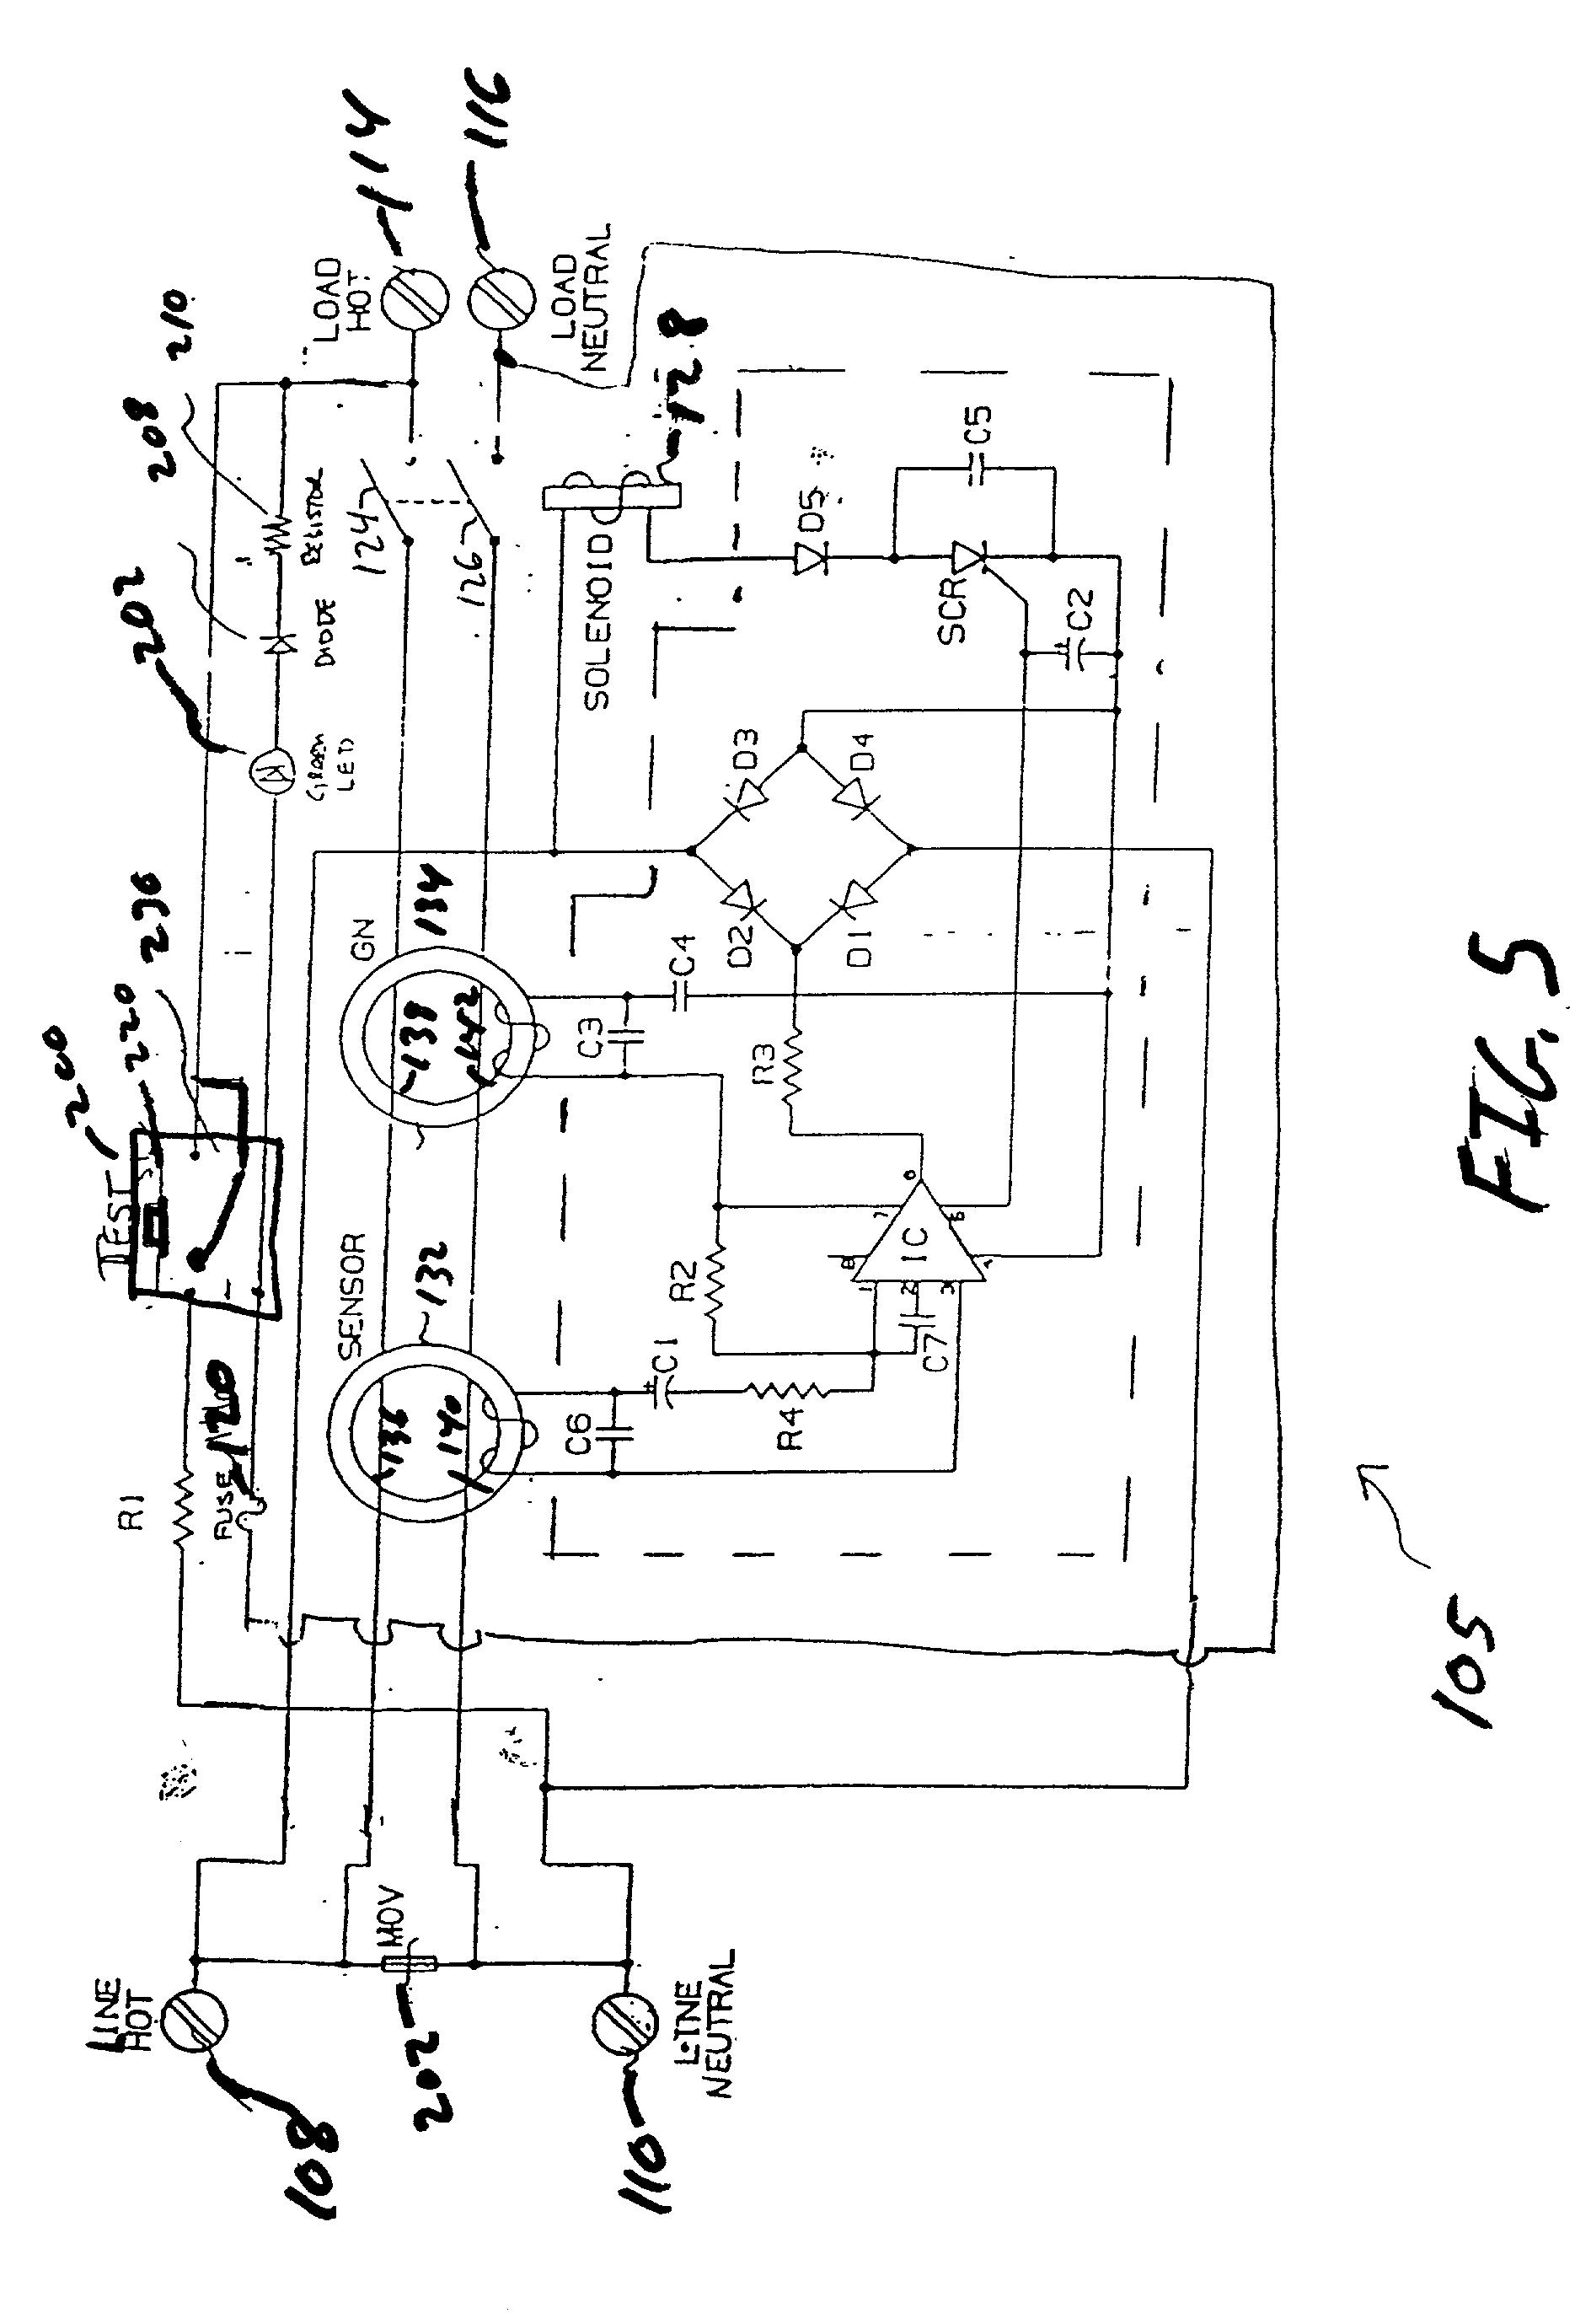 fault circuit interrupter